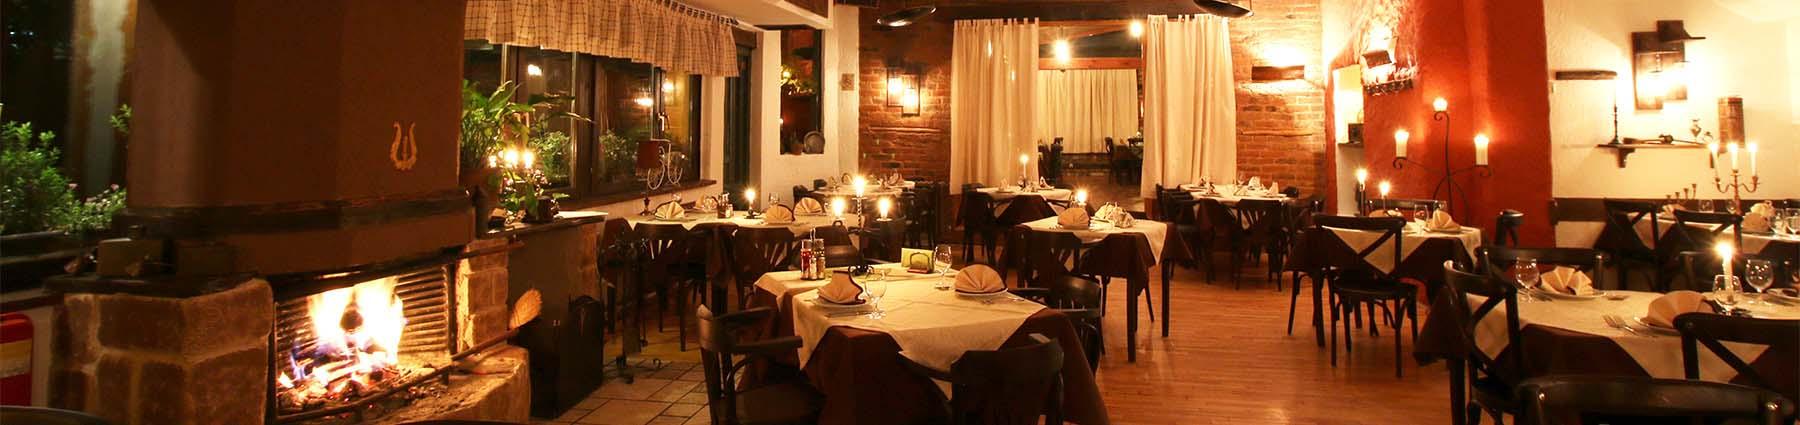 Restaurant Lyra